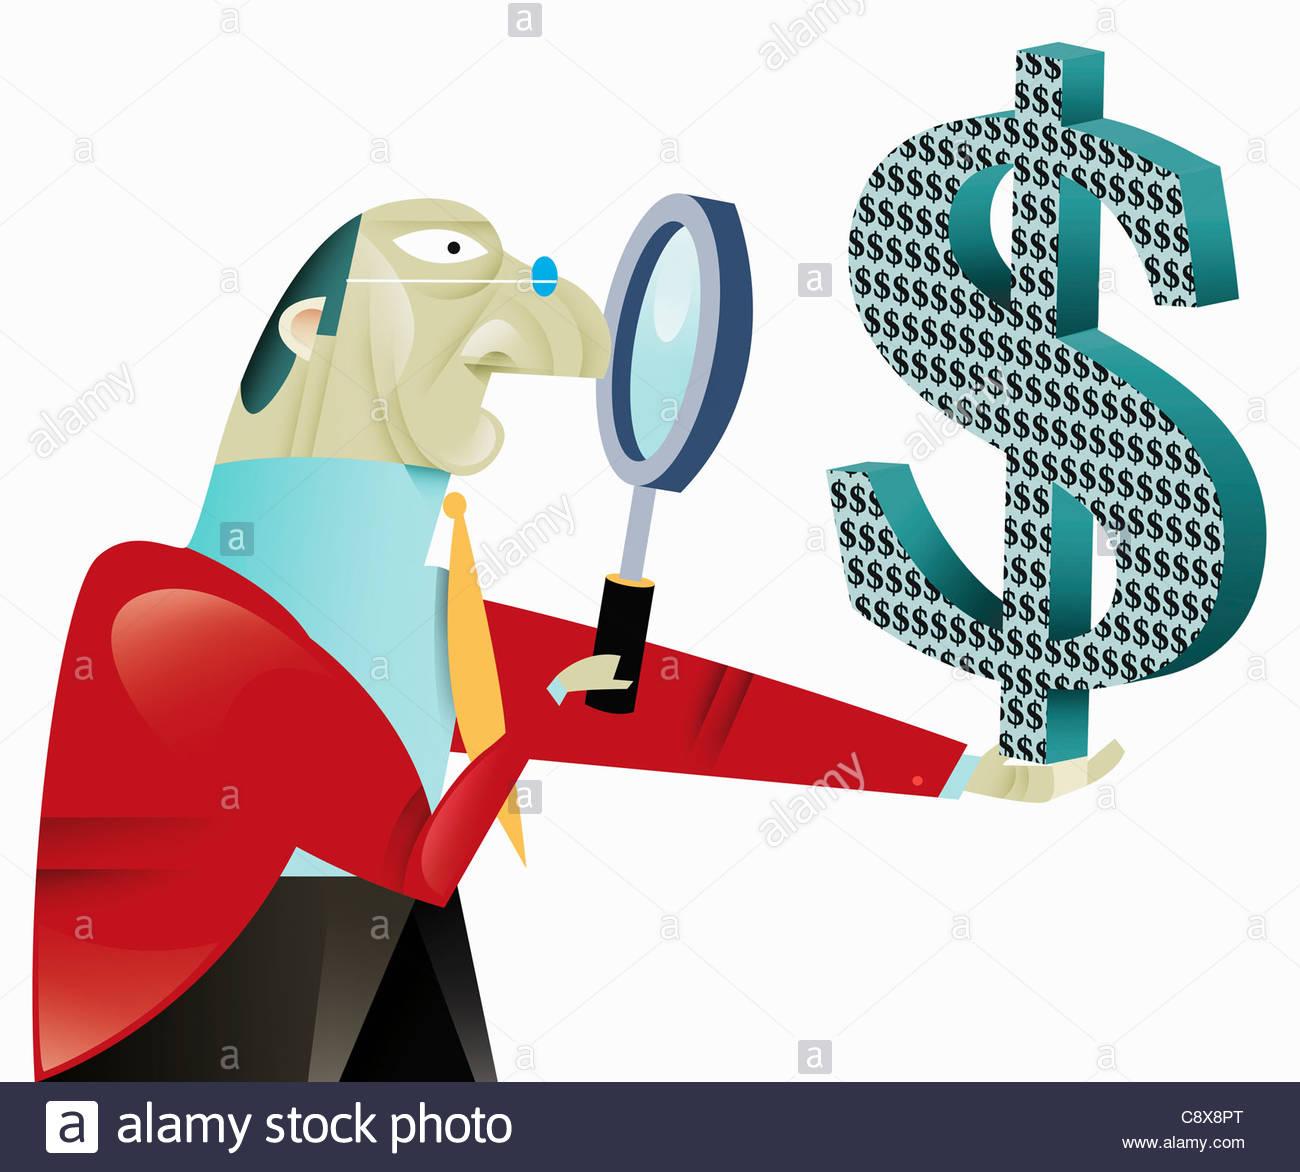 Businessman examining dollar symbol with magnifying glass - Stock Image